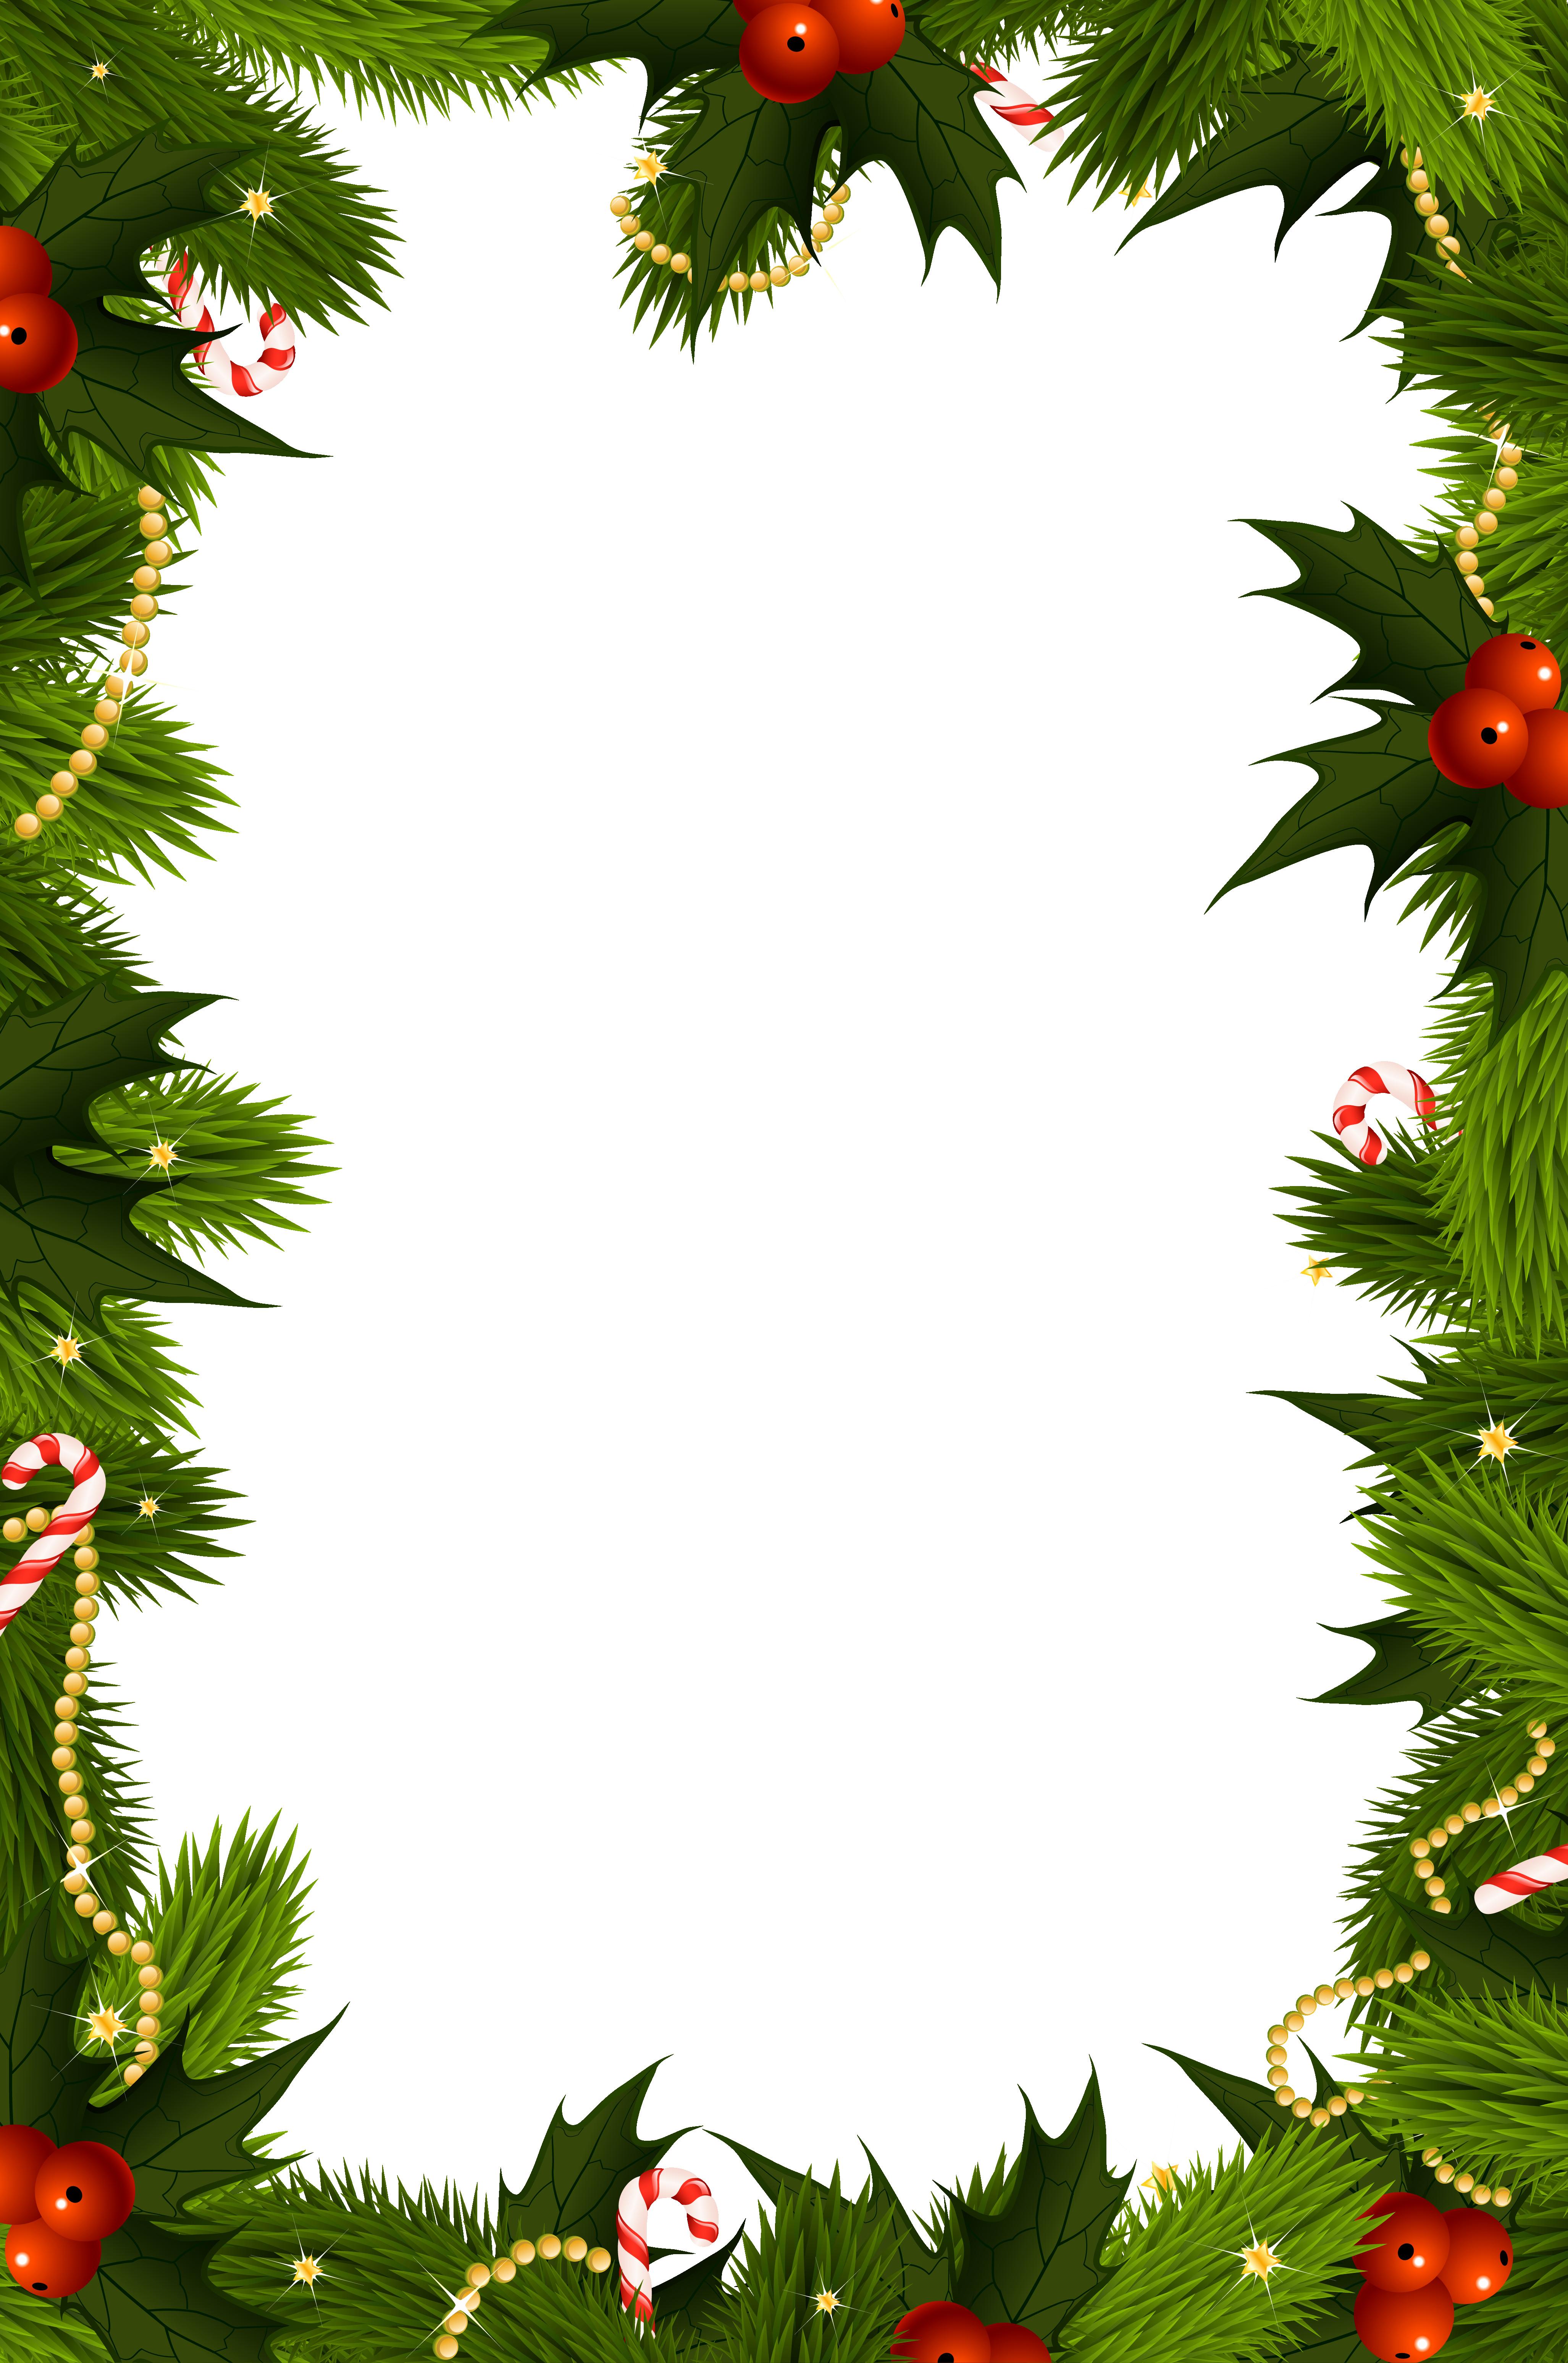 Festive Borders for Word Document Beautiful Transparent Christmas Border – Happy Holidays